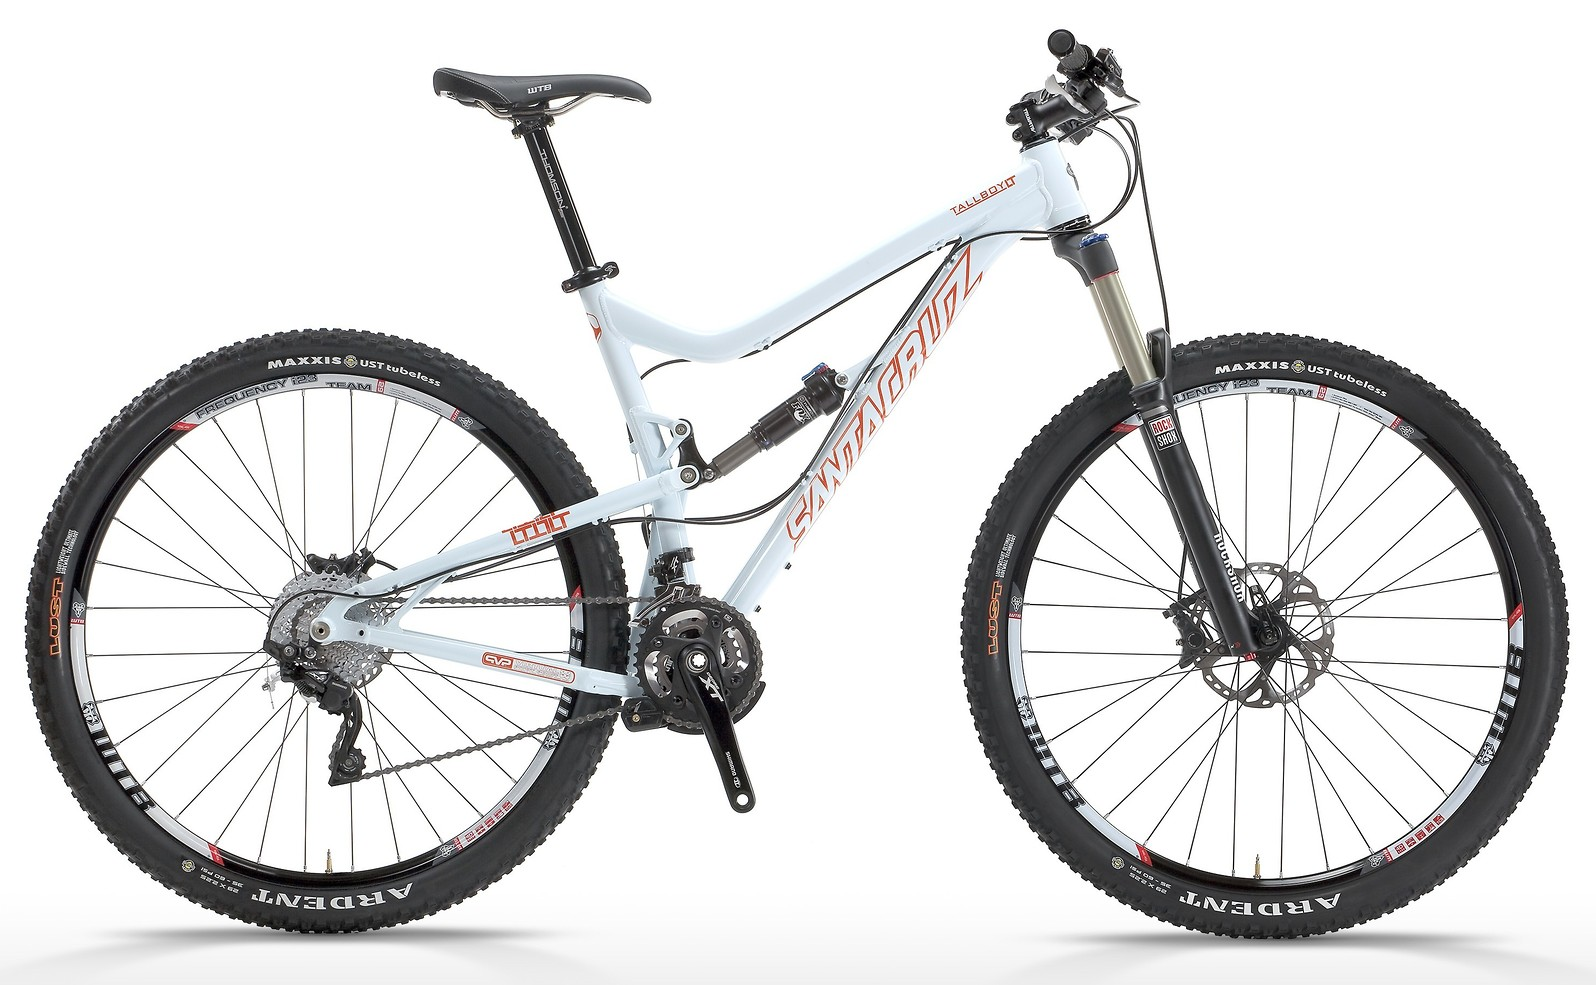 2014 Santa Cruz Tallboy LT X0-1 AM 29 Bike 2013 TALLBOY LTcatalogflat